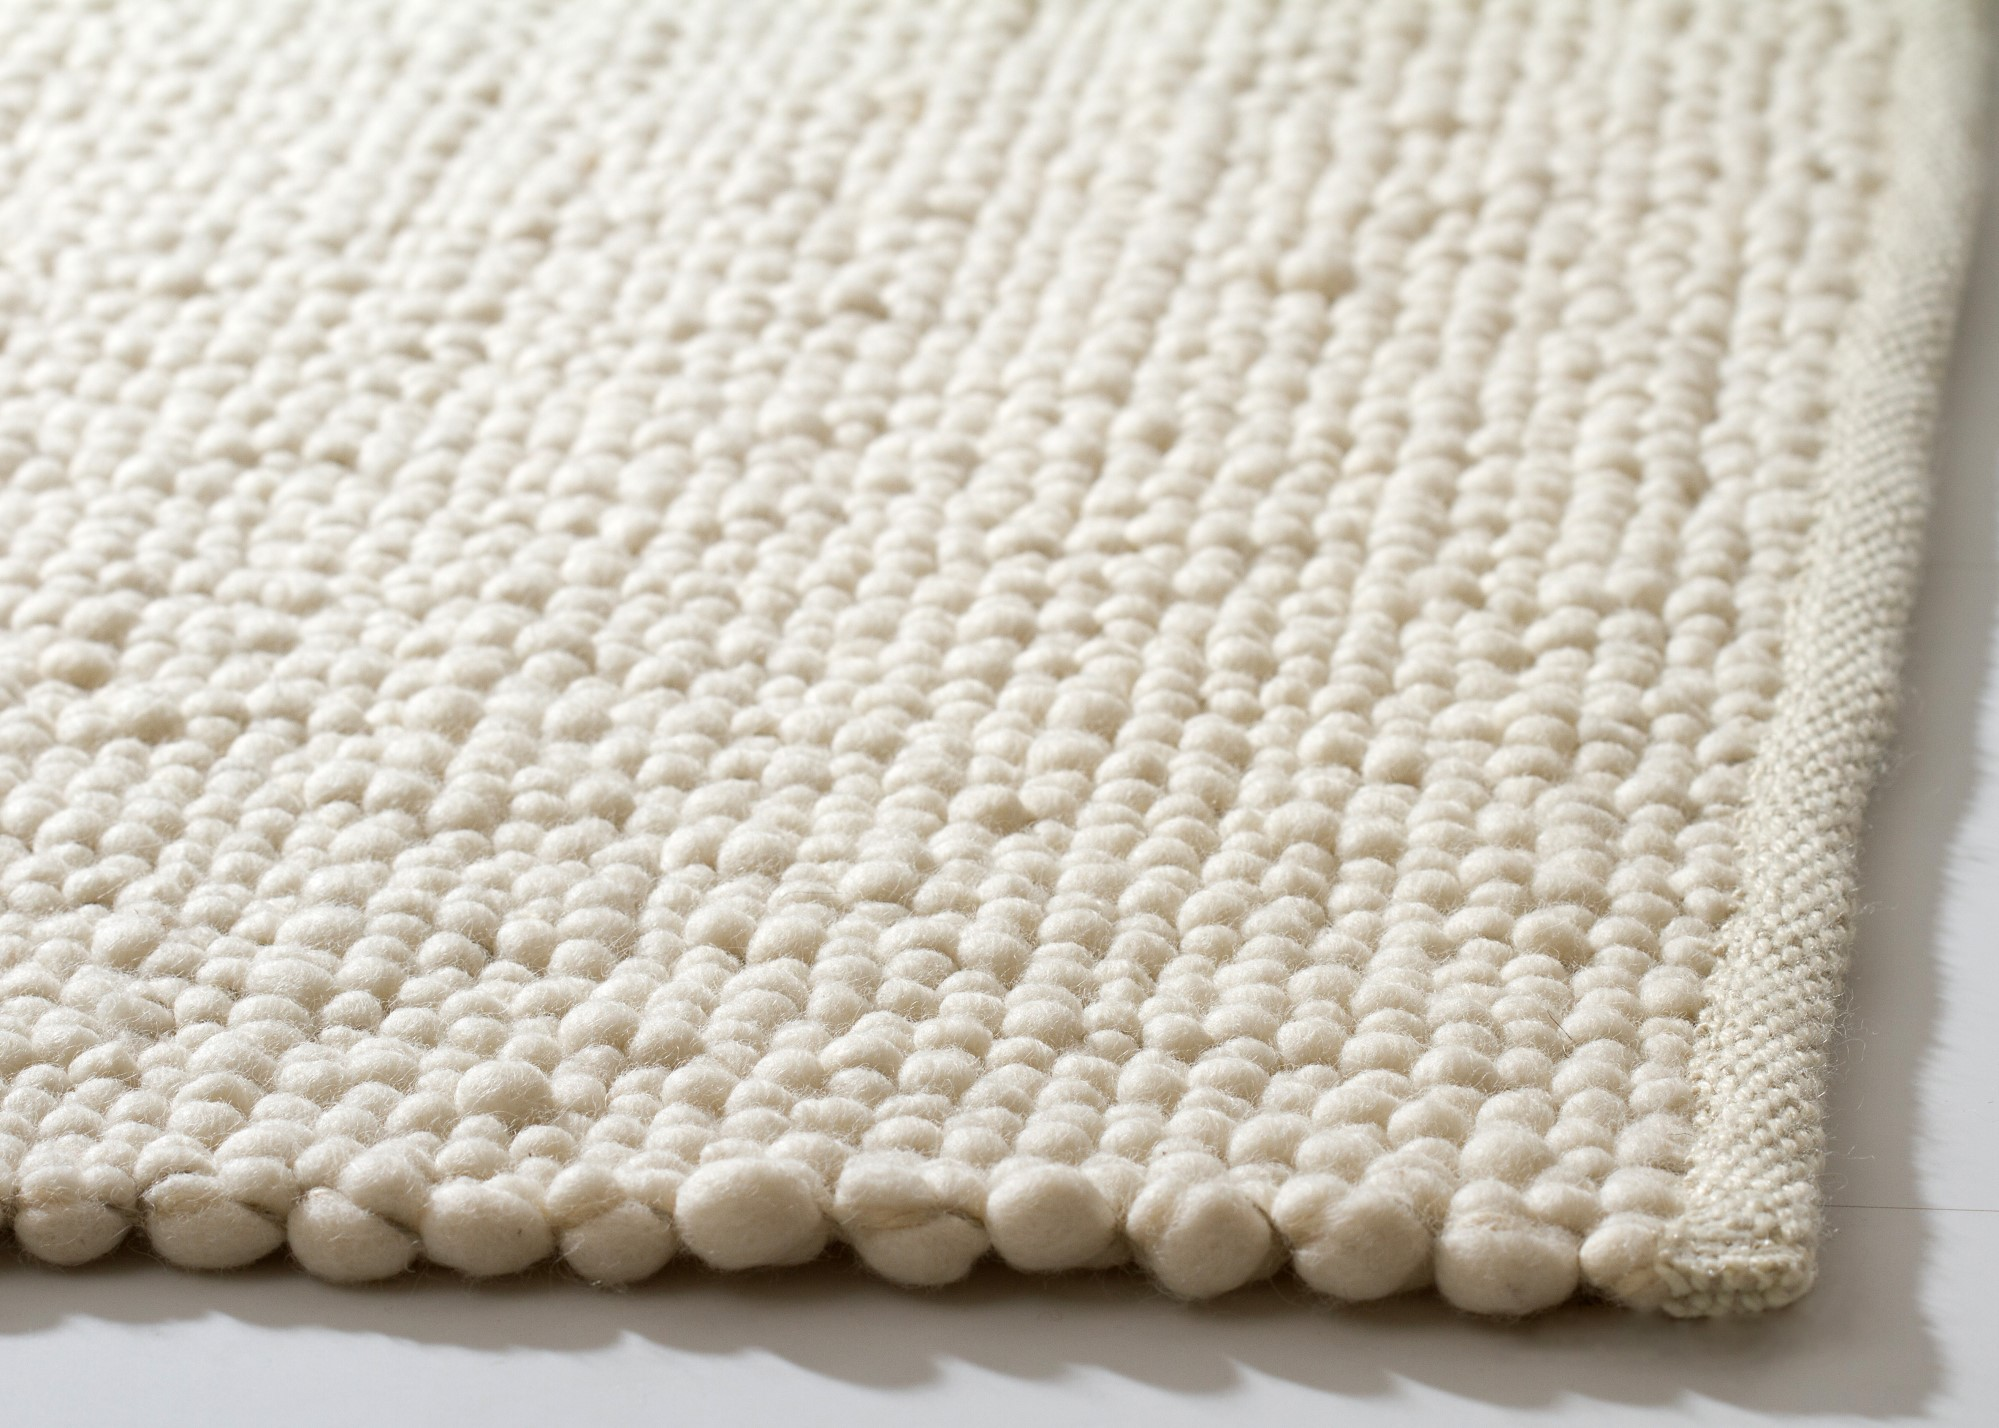 Handwoven Rug Lech Hard Wearing Jute Fabric 100 New Wool Ebay Karpet 250x350 Bcf Super Quality